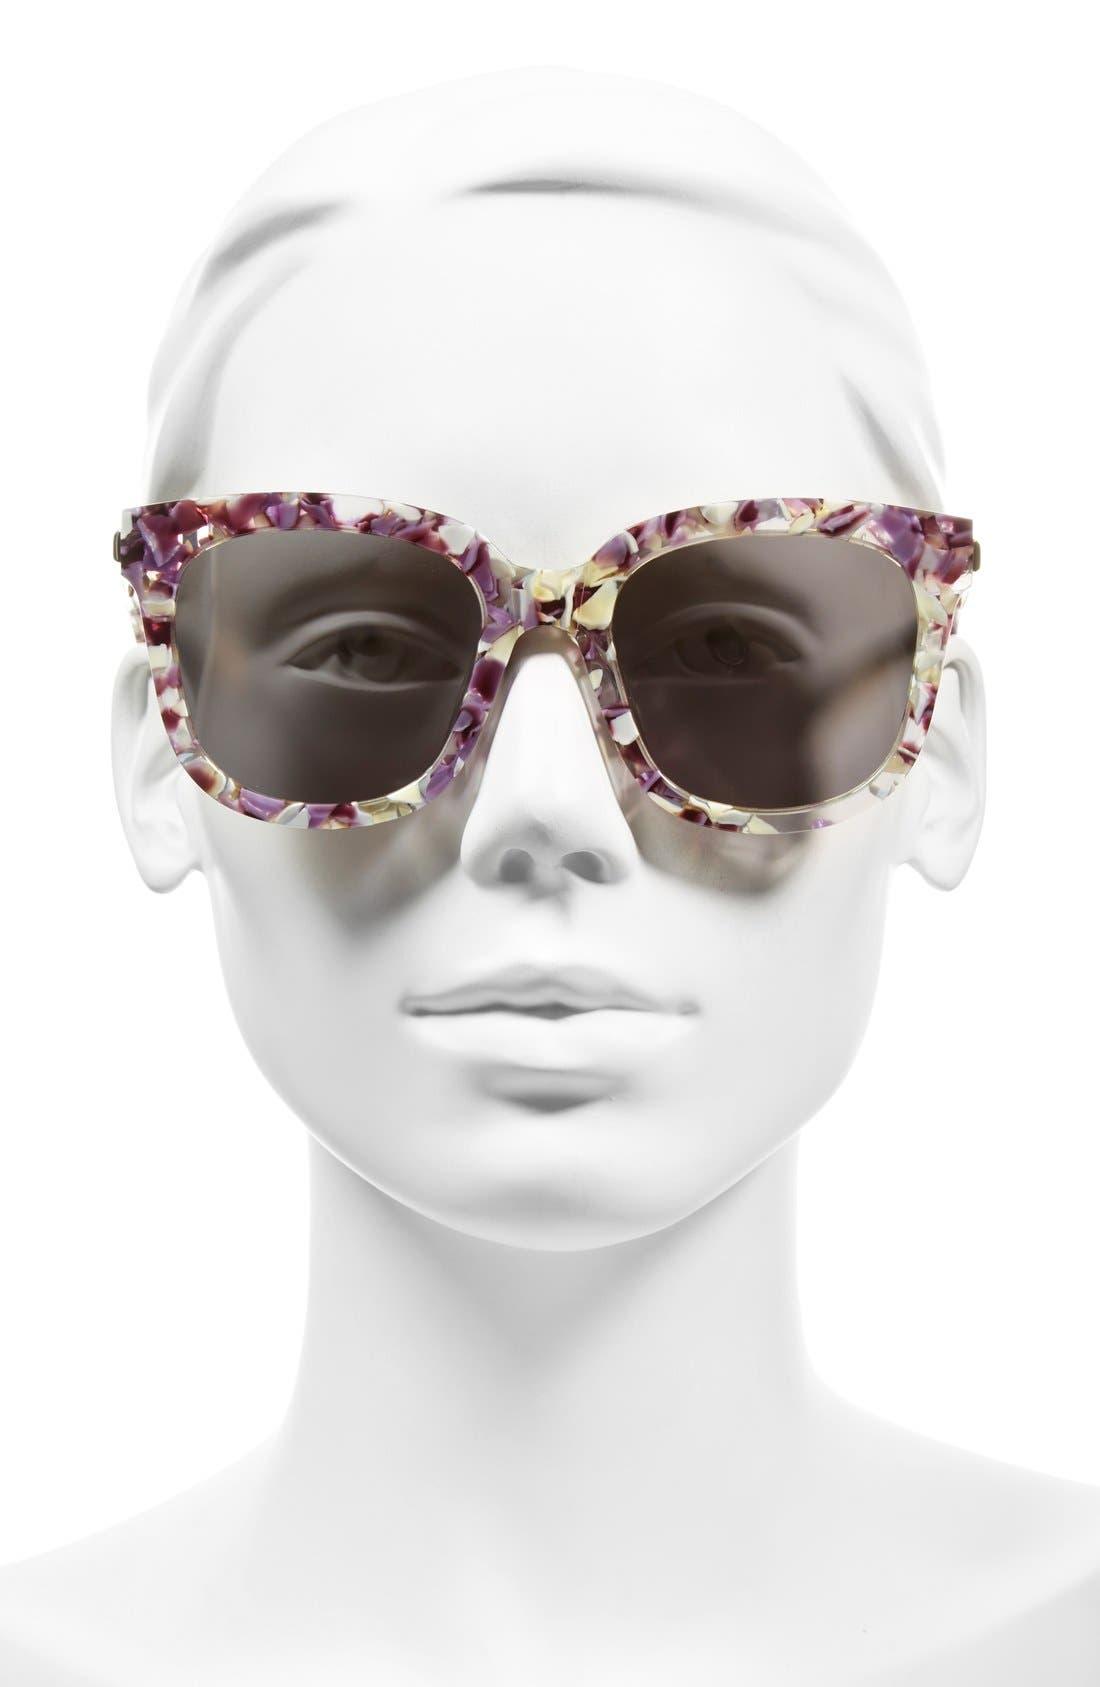 54mm Sunglasses,                             Alternate thumbnail 2, color,                             Light Purple/ Clear